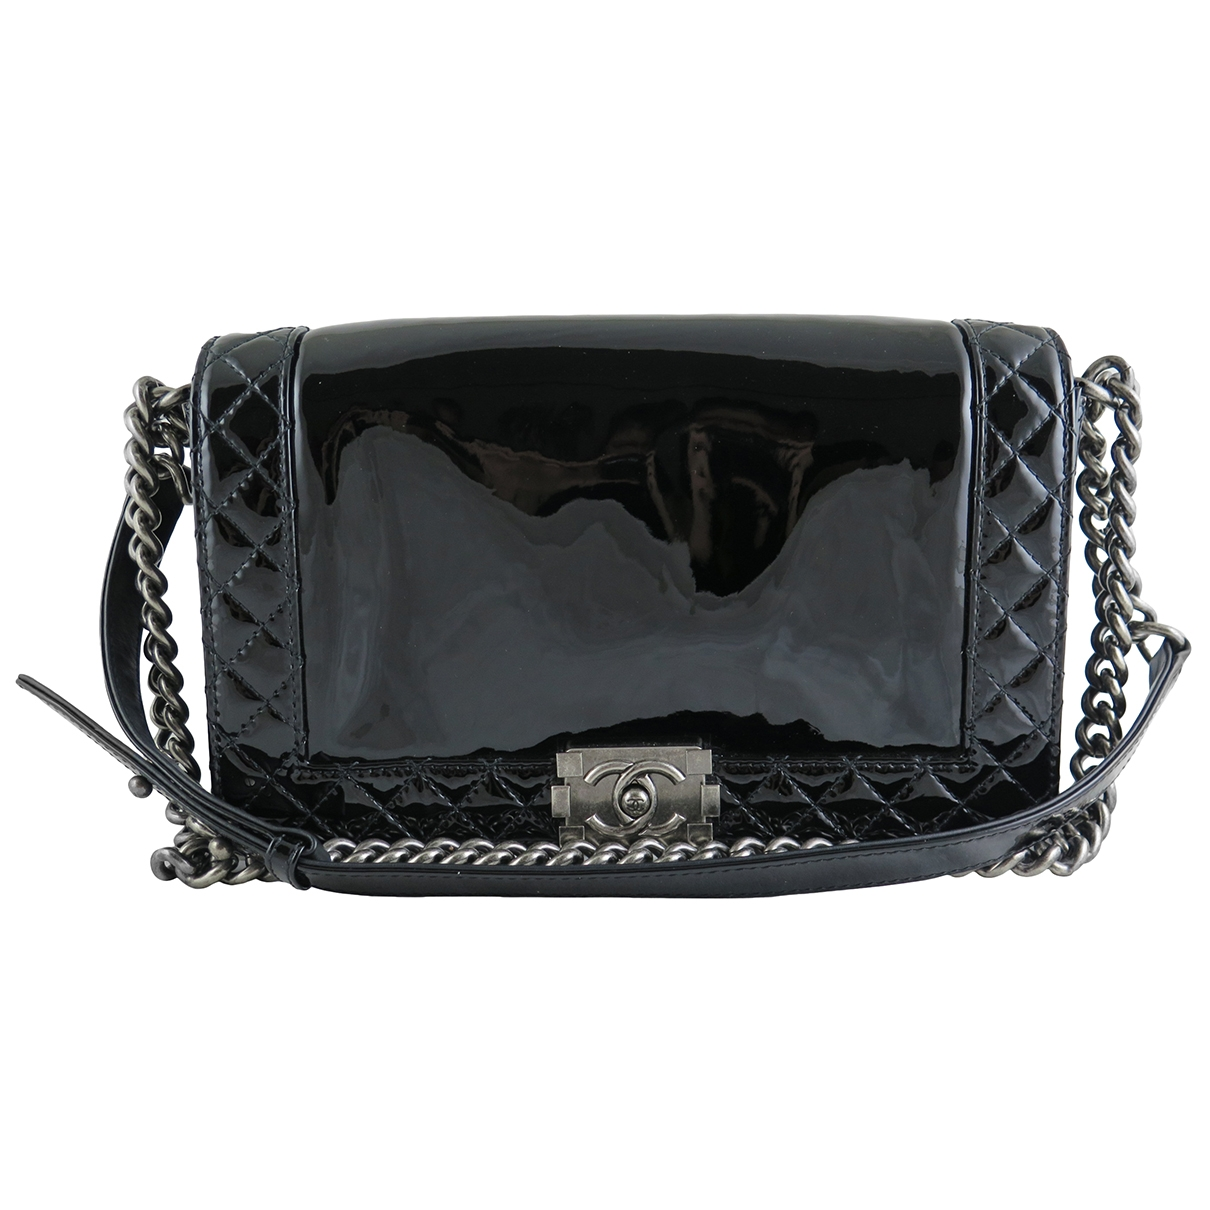 Chanel Timeless/Classique Handtasche in  Schwarz Lackleder